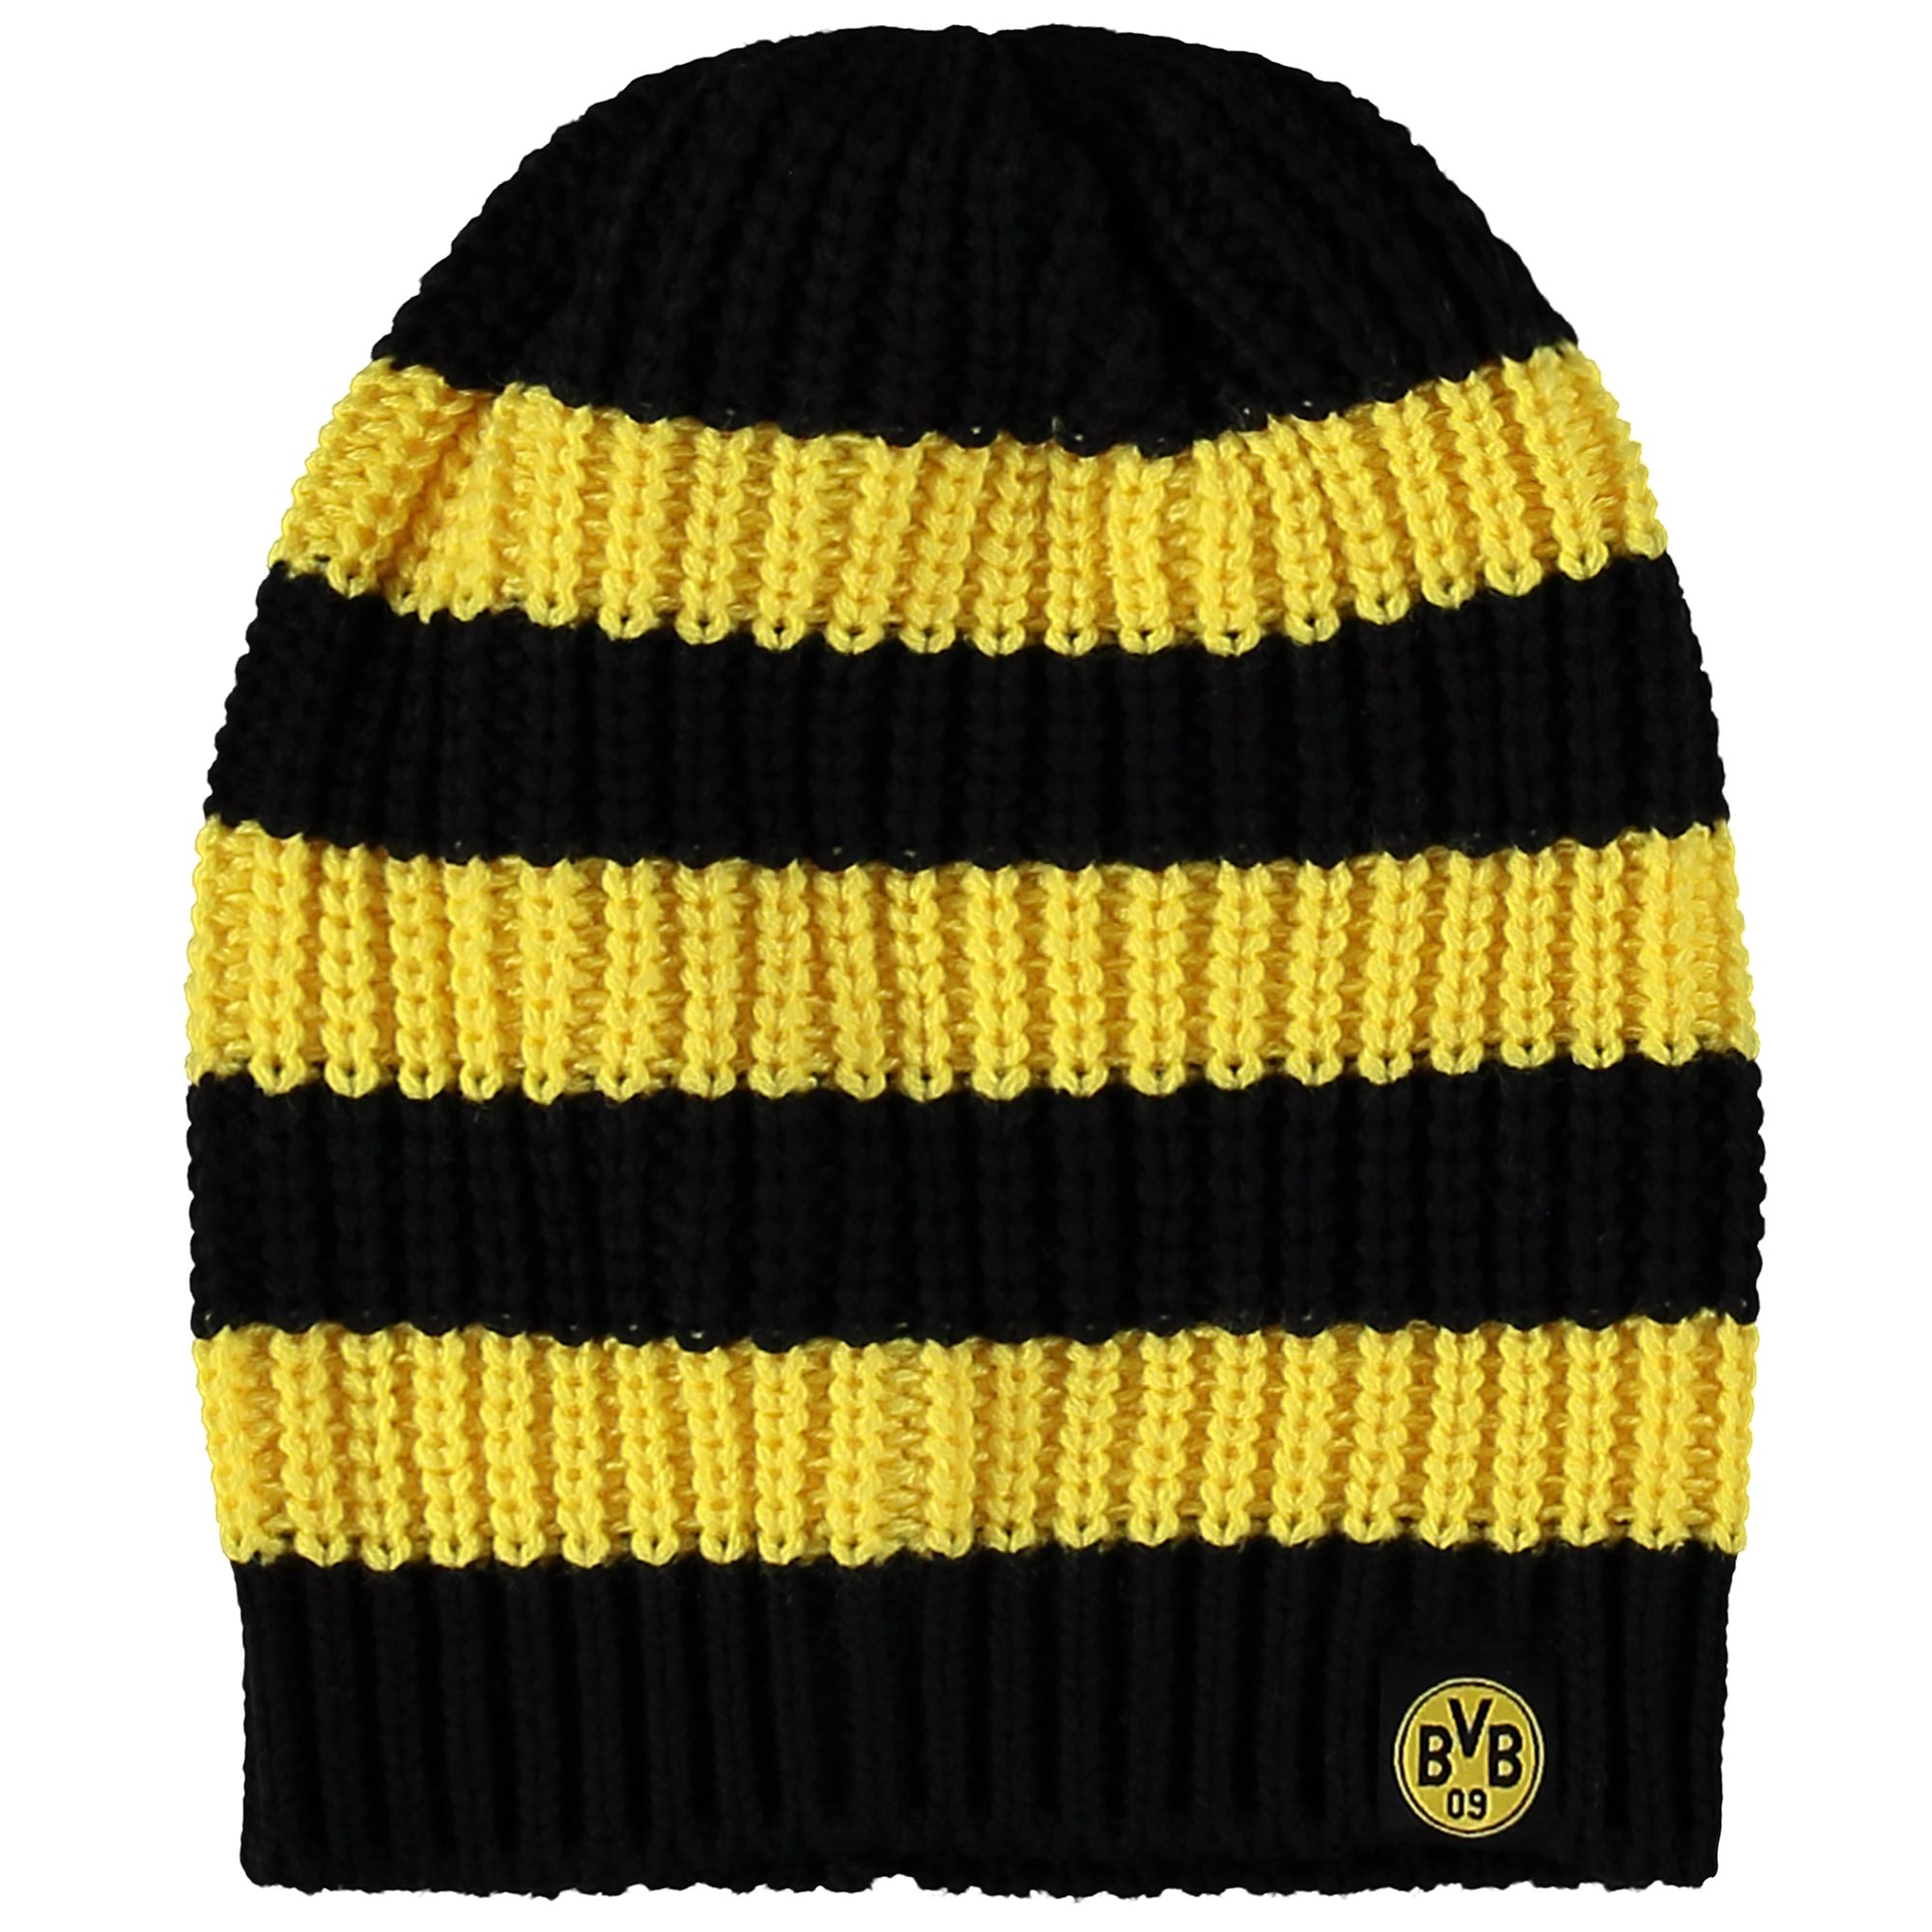 BVB Striped Beanie Hat – Black/Yellow